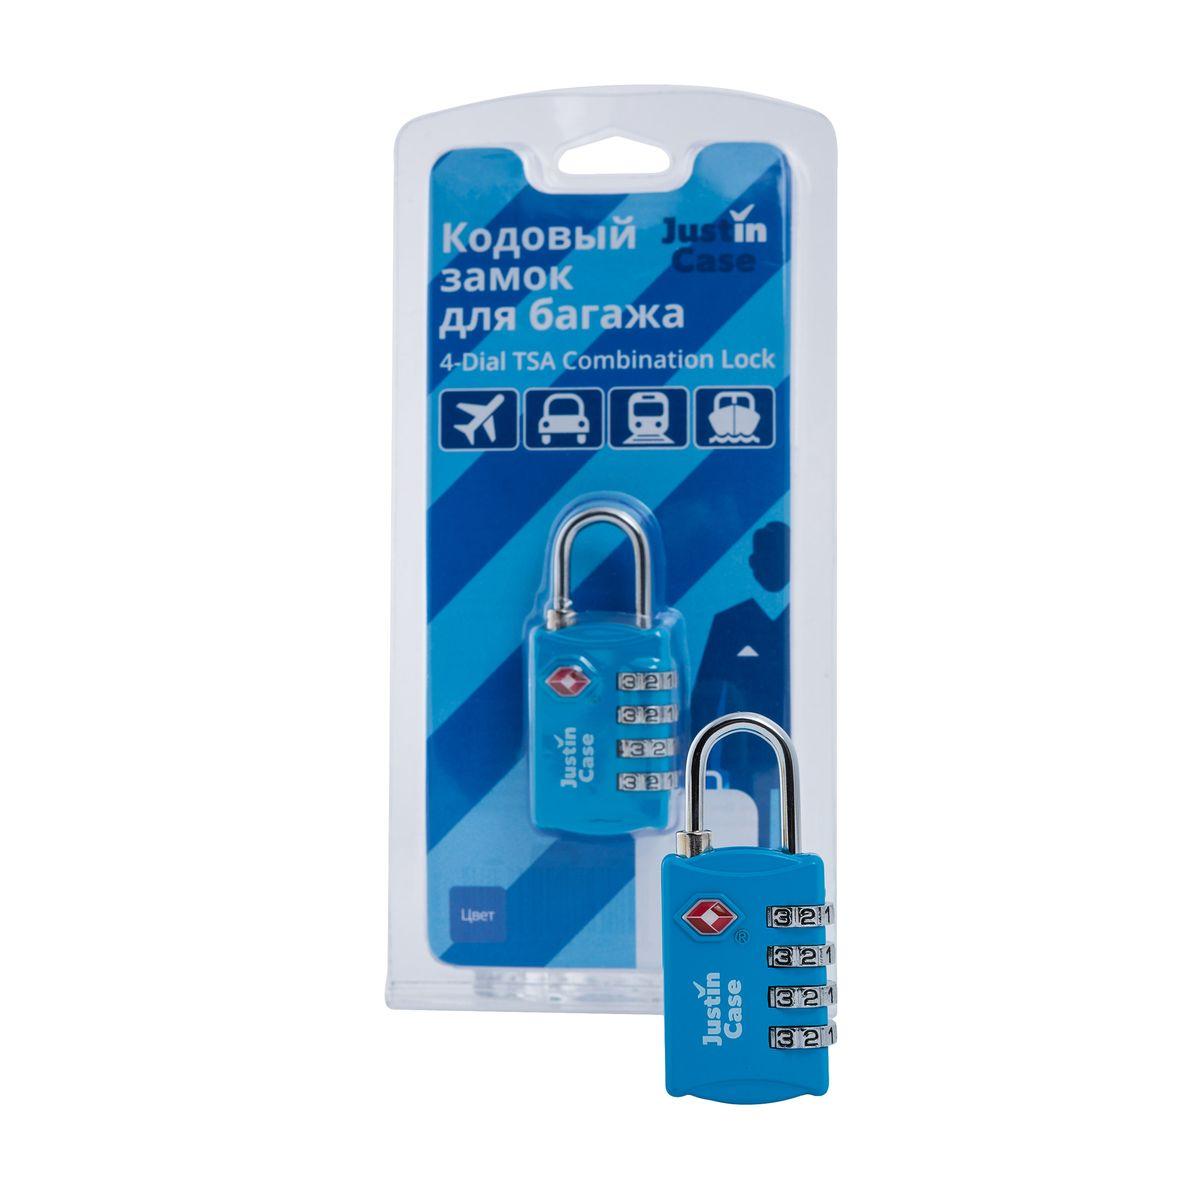 цена на Замок кодовый для багажа JustinCase 4-Dial TSA Combination Lock, цвет: голубой